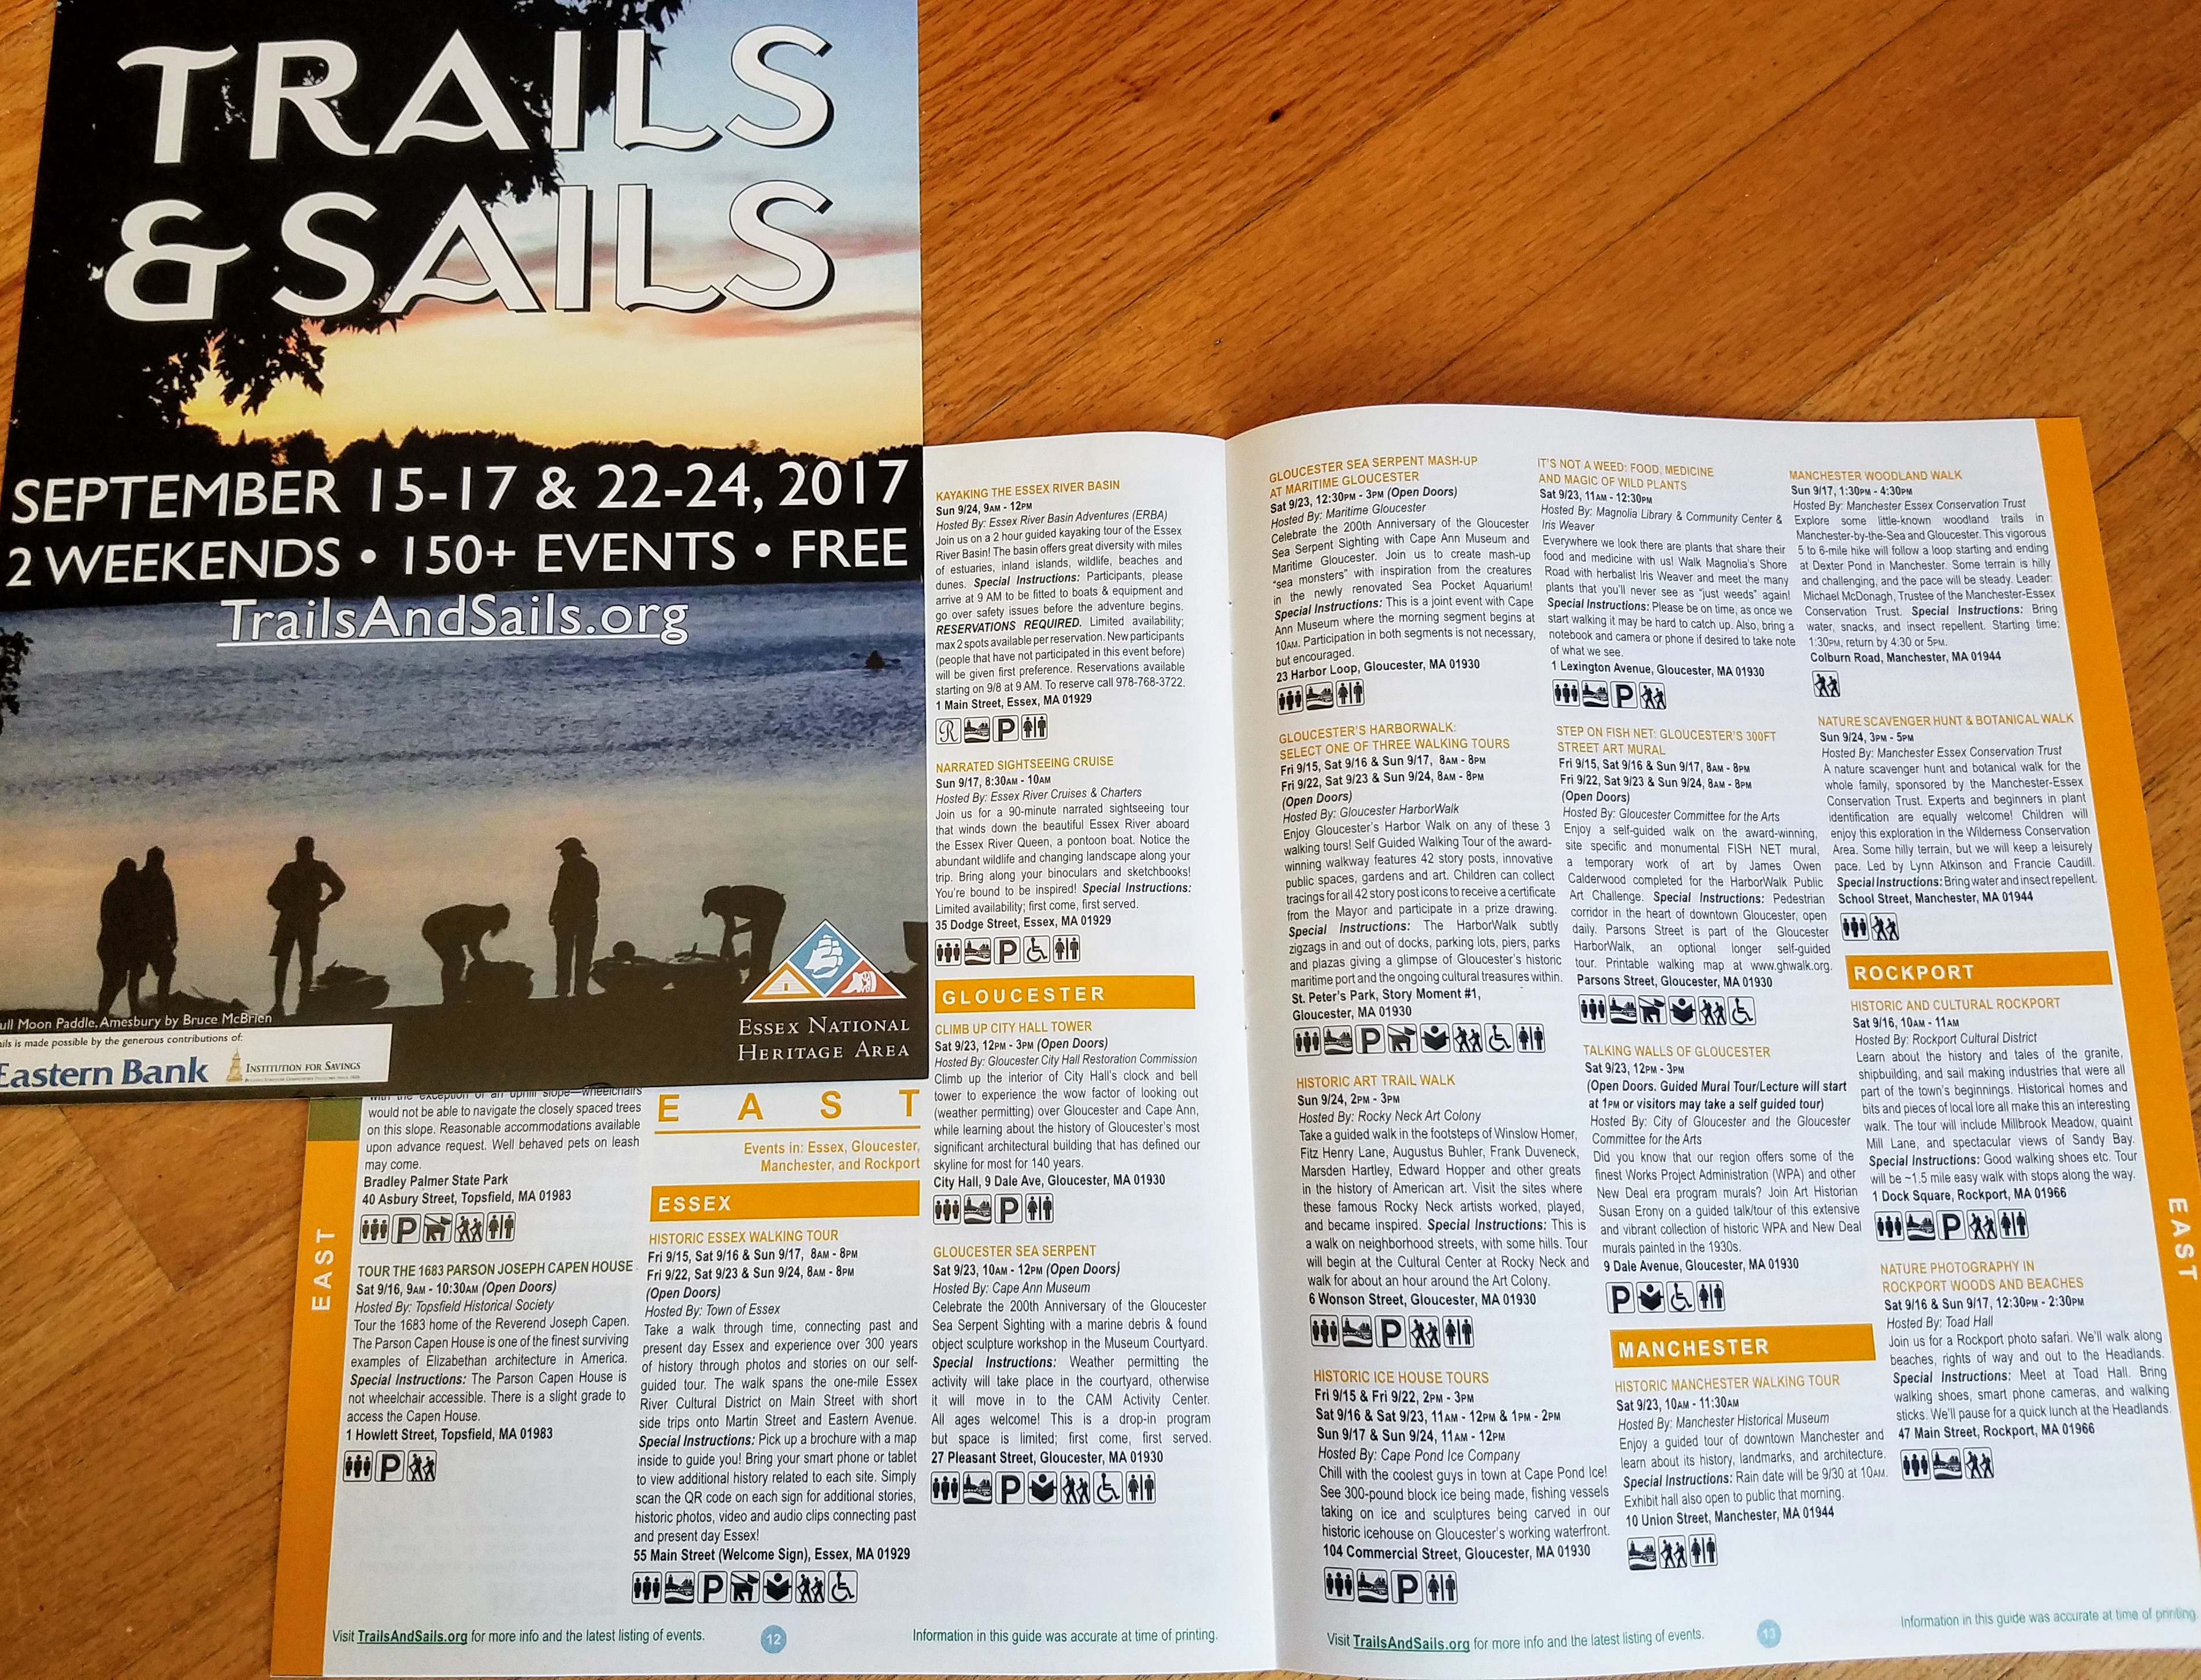 2017 Essex National Heritage Trails and Sails #TrailsAndSails